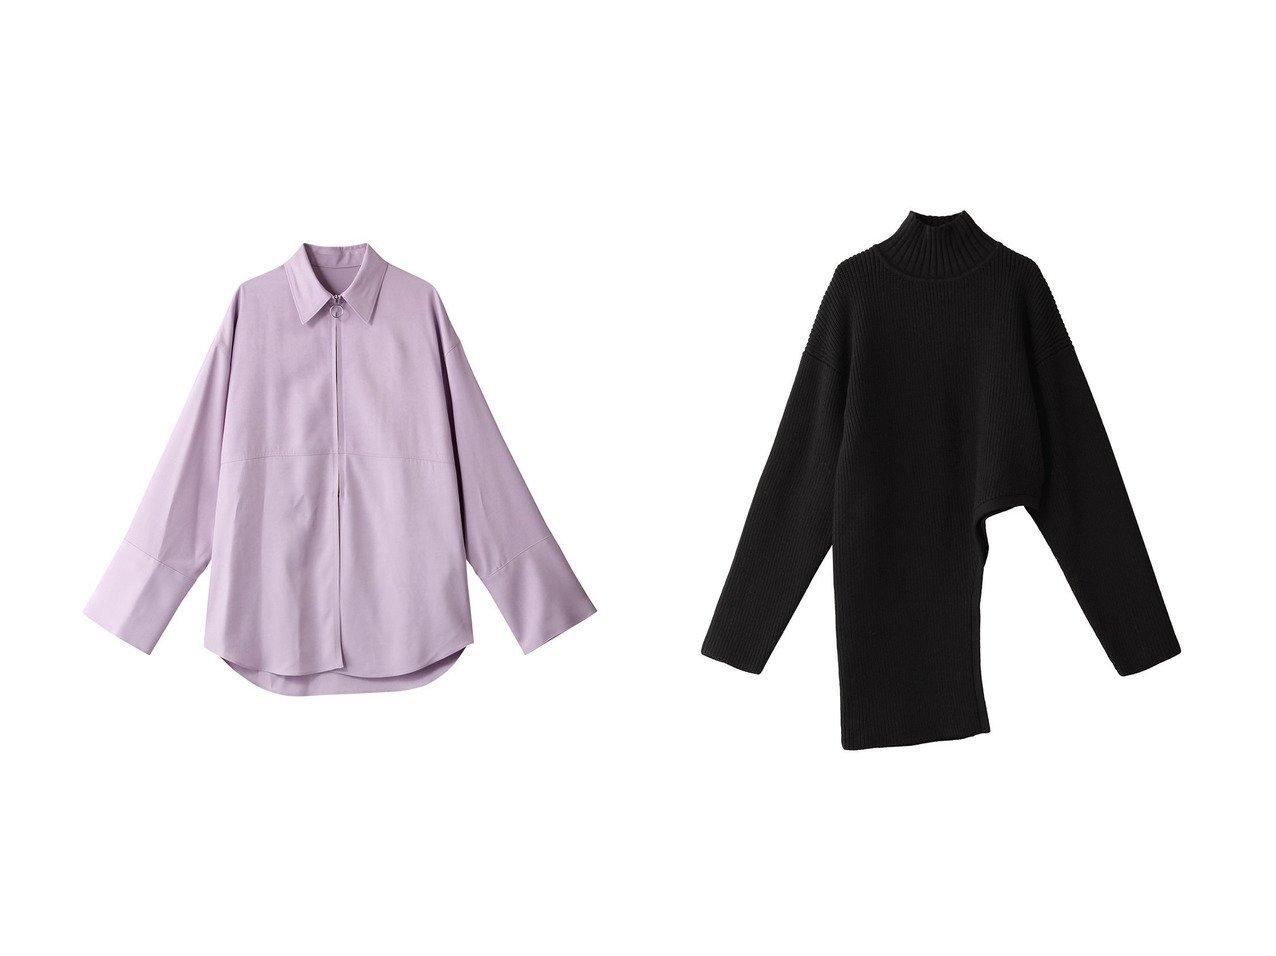 【LE CIEL BLEU/ルシェル ブルー】のジップフロントシャツ&ラウンドカットニット 【トップス・カットソー】おすすめ!人気、トレンド・レディースファッションの通販   おすすめで人気の流行・トレンド、ファッションの通販商品 メンズファッション・キッズファッション・インテリア・家具・レディースファッション・服の通販 founy(ファニー) https://founy.com/ ファッション Fashion レディースファッション WOMEN トップス・カットソー Tops/Tshirt シャツ/ブラウス Shirts/Blouses ニット Knit Tops プルオーバー Pullover 2021年 2021 2021春夏・S/S SS/Spring/Summer/2021 S/S・春夏 SS・Spring/Summer シンプル ジップ スリーブ フロント ロング 春 Spring 羽織 長袖 アシンメトリー ハイネック ラウンド |ID:crp329100000026669